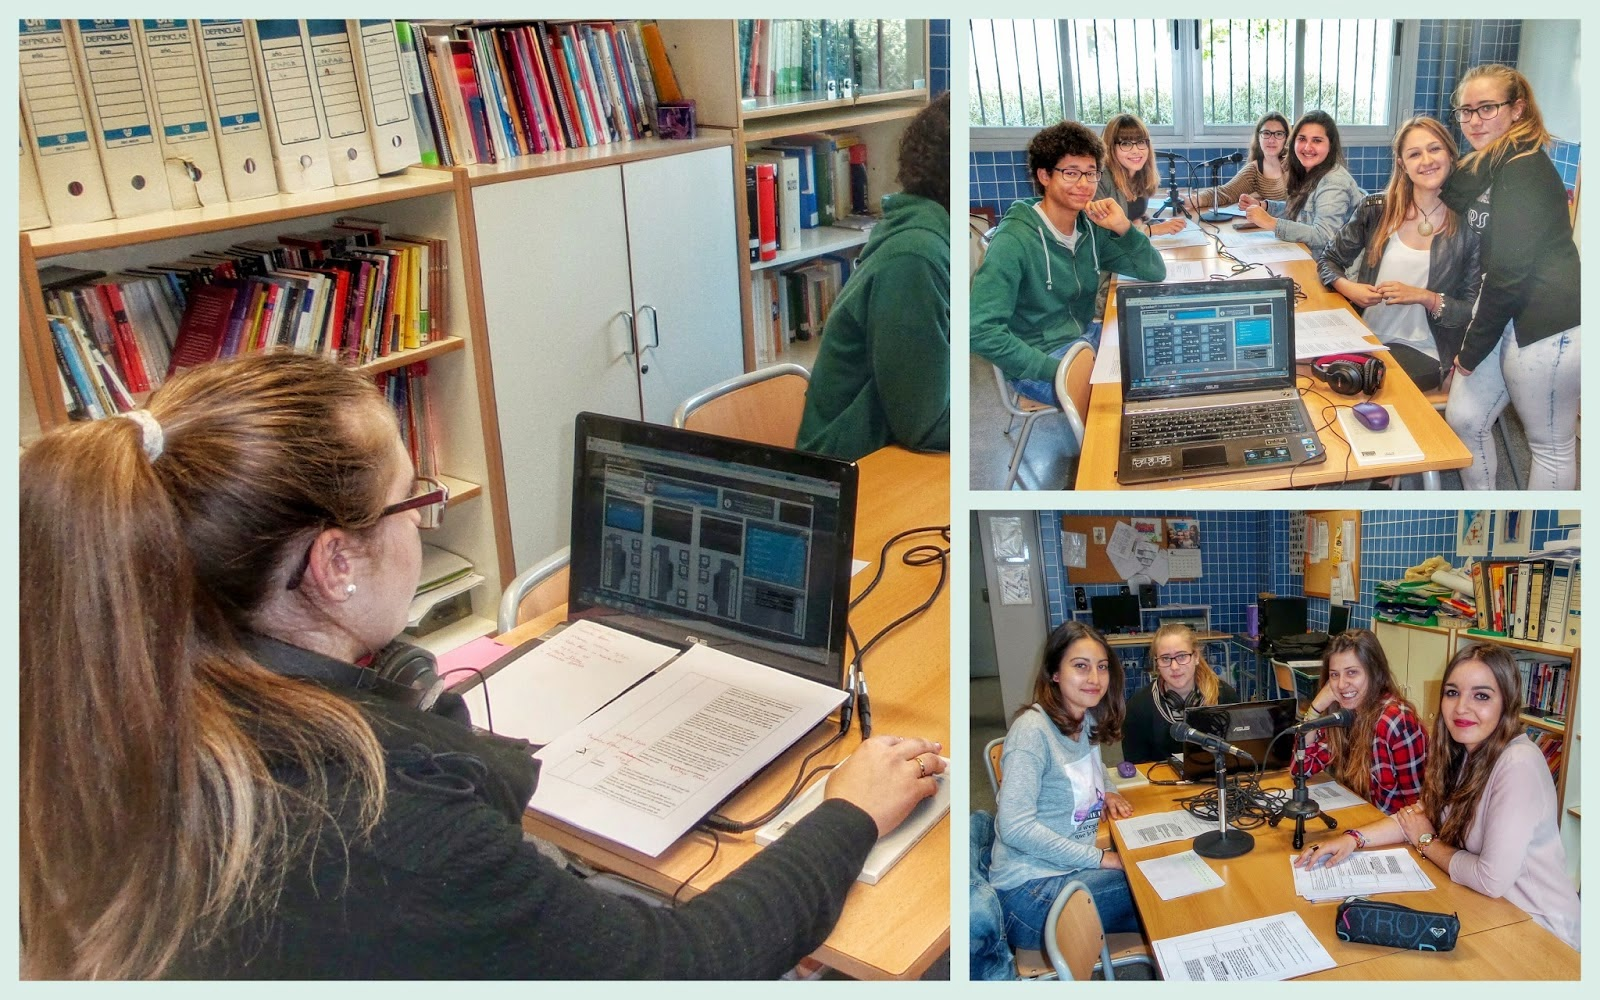 5é Projecte: Programa de Ràdio